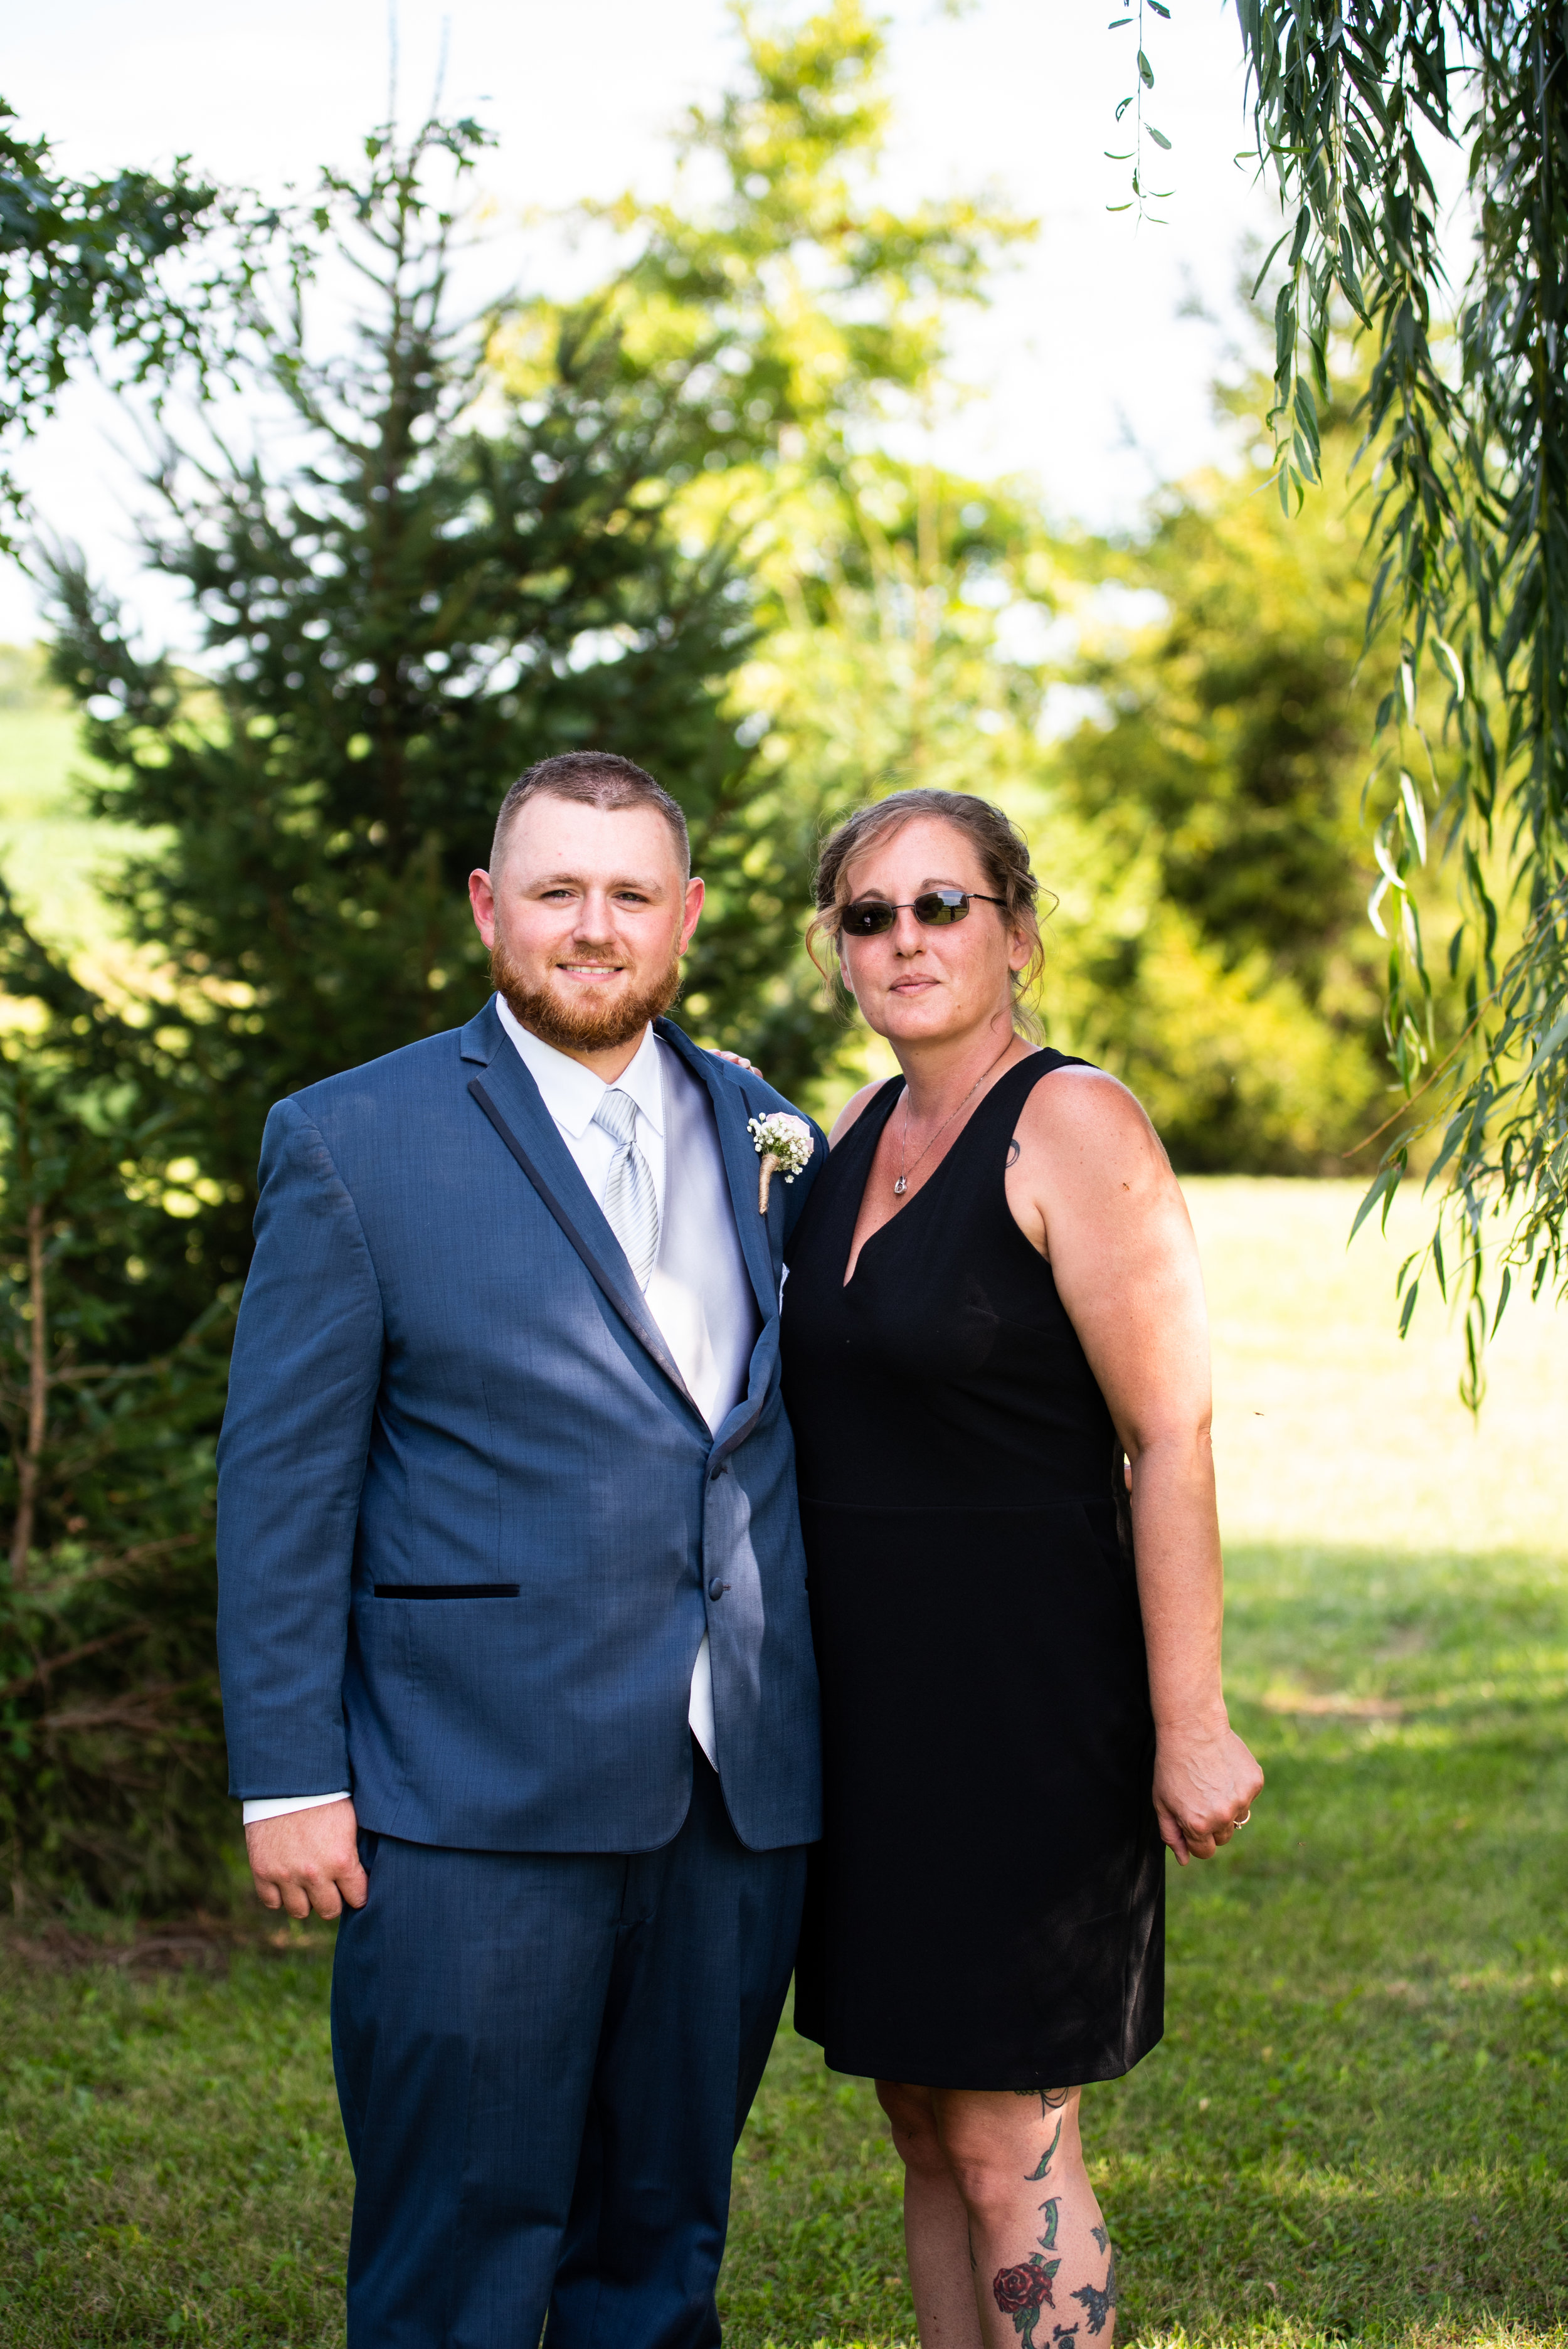 wedding (1 of 1)-125.jpg